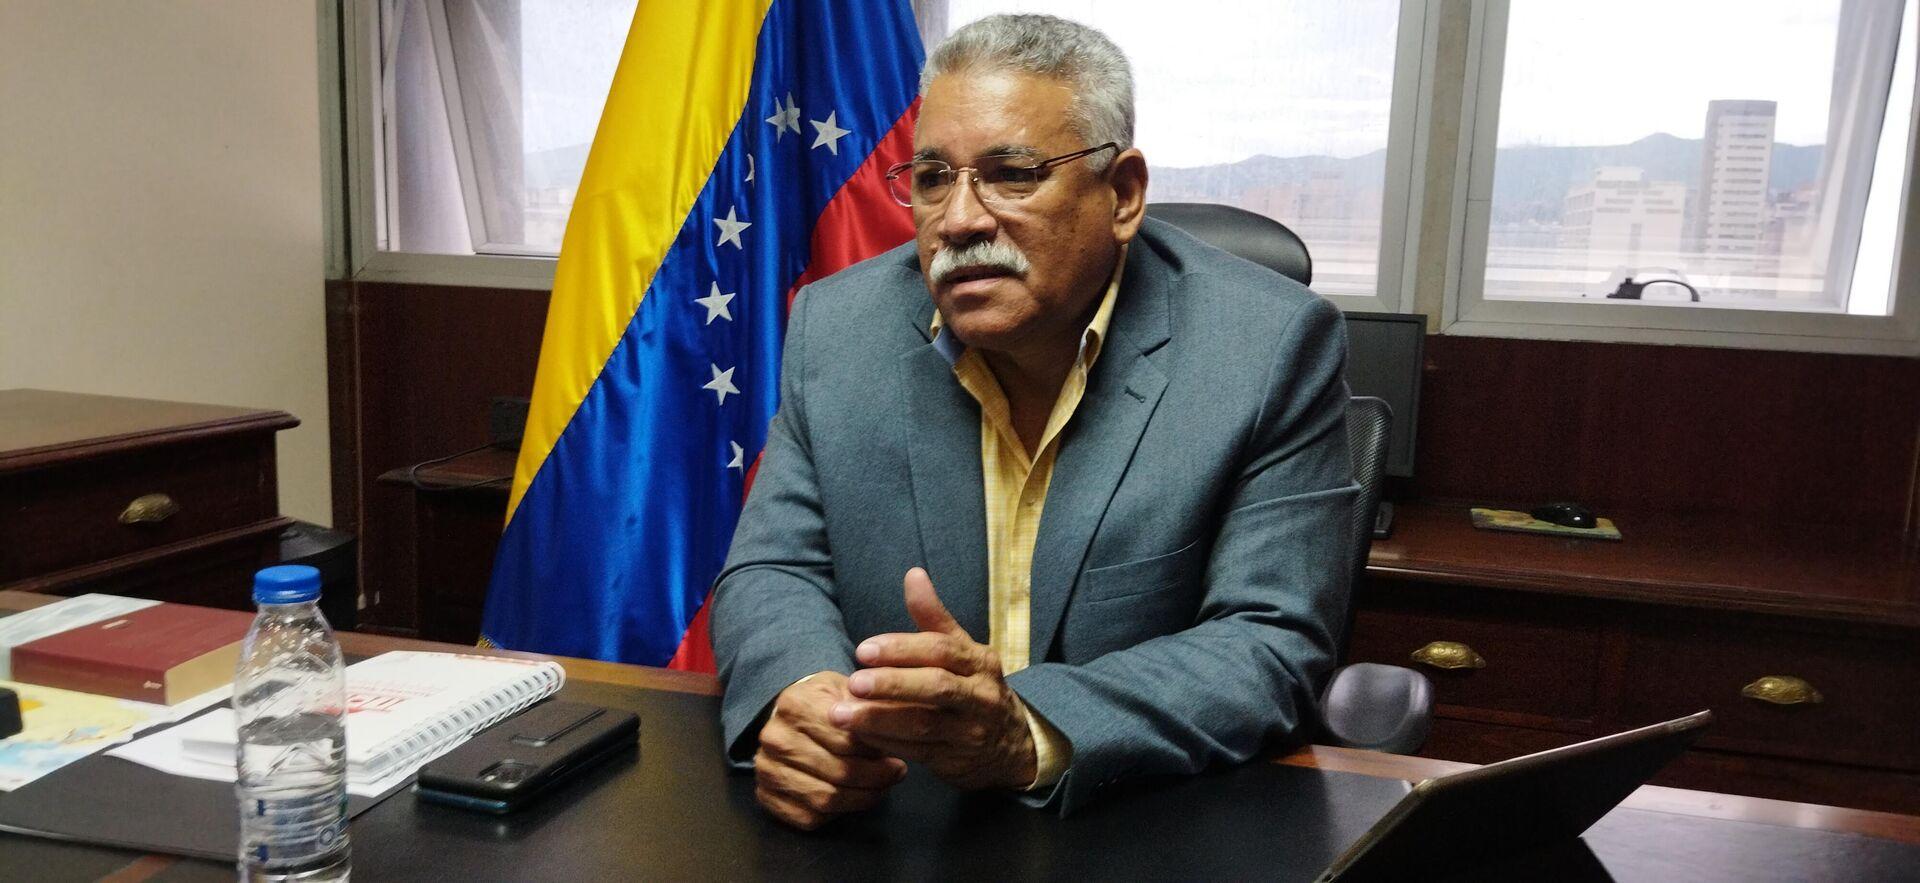 Diputado venezolano Ángel Rodríguez - Sputnik Mundo, 1920, 10.09.2021